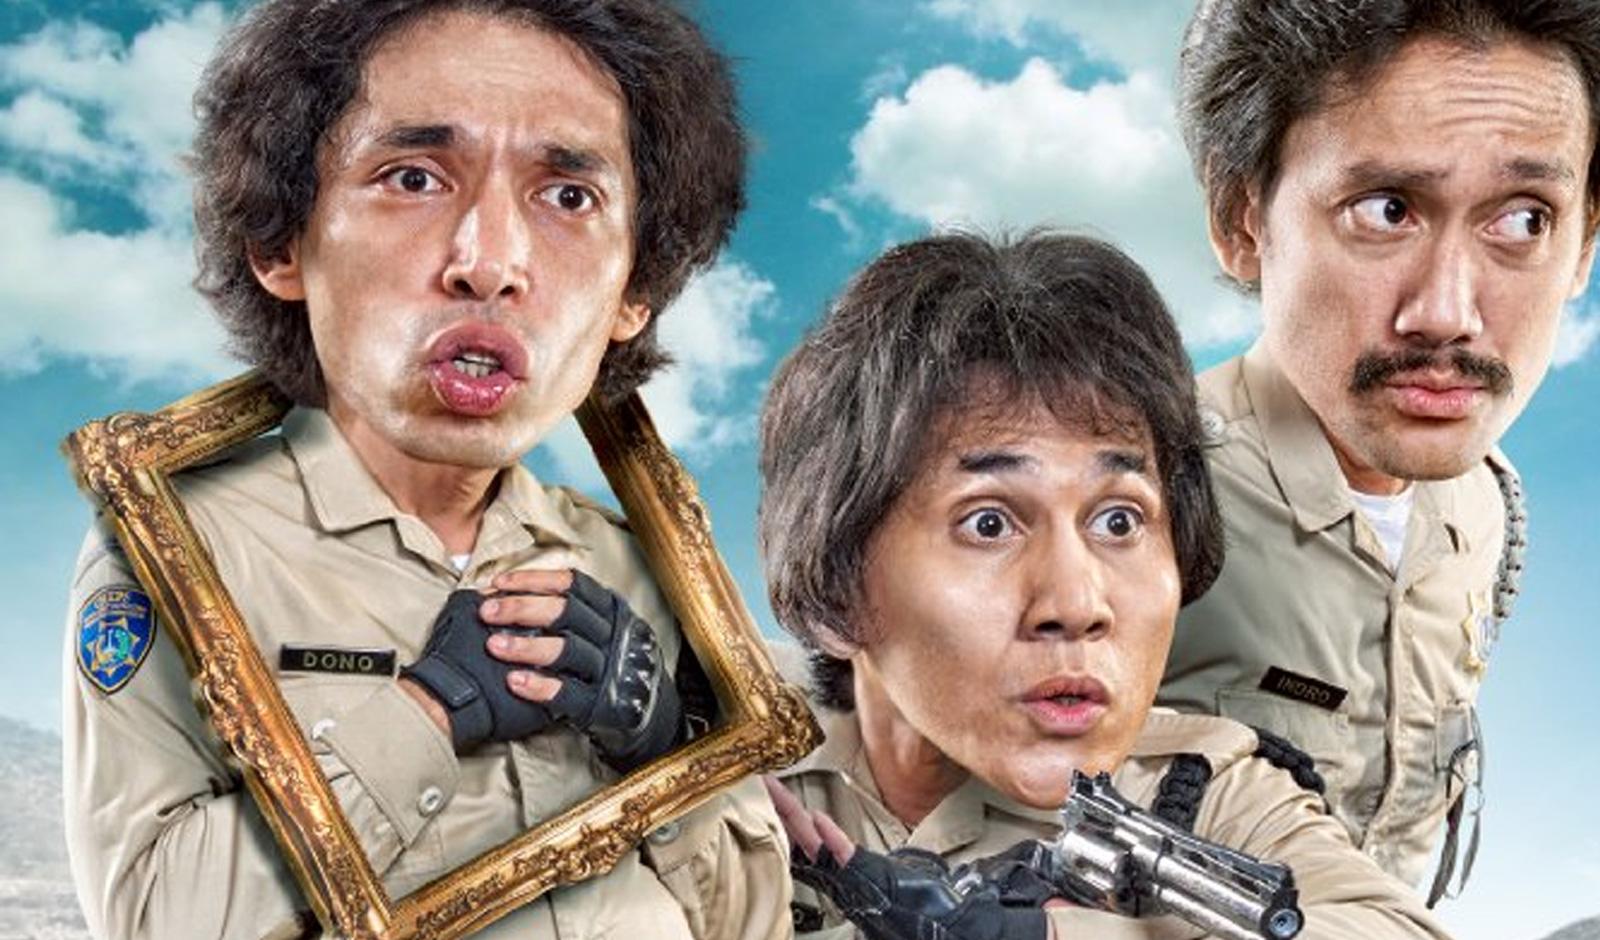 download film indonesia terbaru warkop dki reborn part 2 rh daxueyingyu com download film warkop dki reborn jangkrik boss part 2 mp4 download film warkop dki reborn jangkrik boss 1